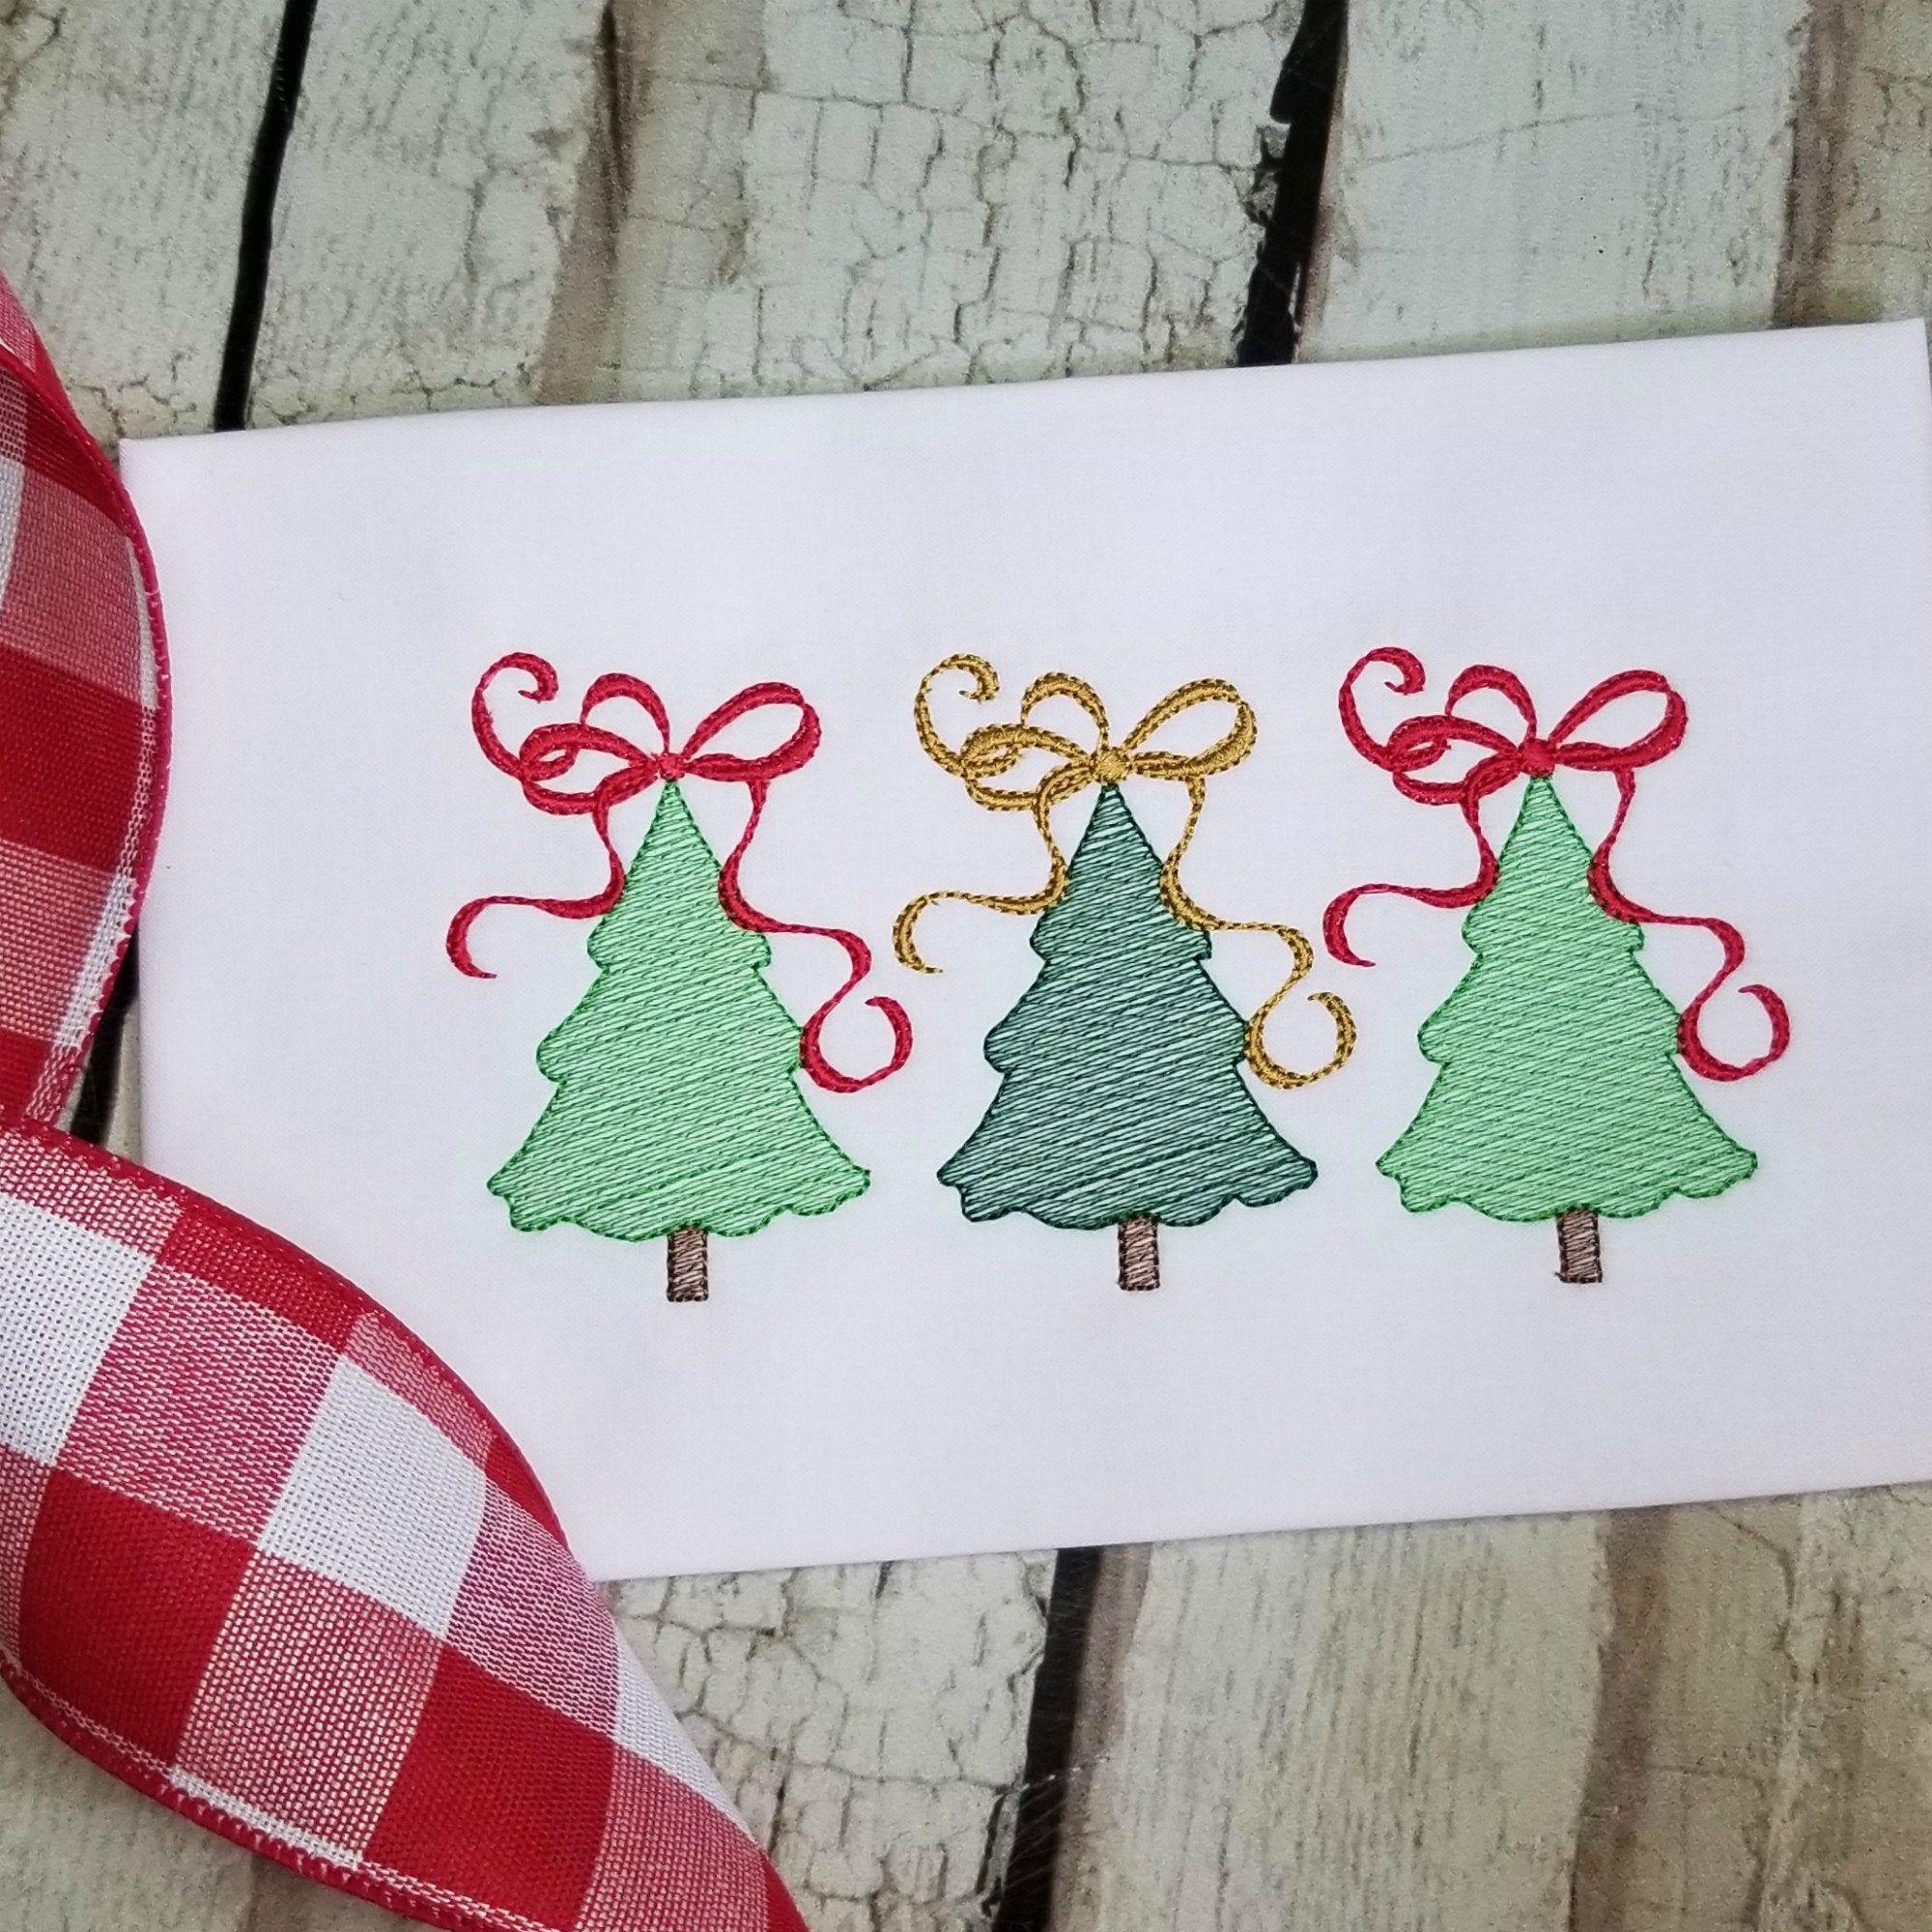 Christmas Tree Trio With Ribbon Machine Embroidery Design Etsy In 2020 Machine Embroidery Designs Embroidery Designs Christmas Embroidery Designs